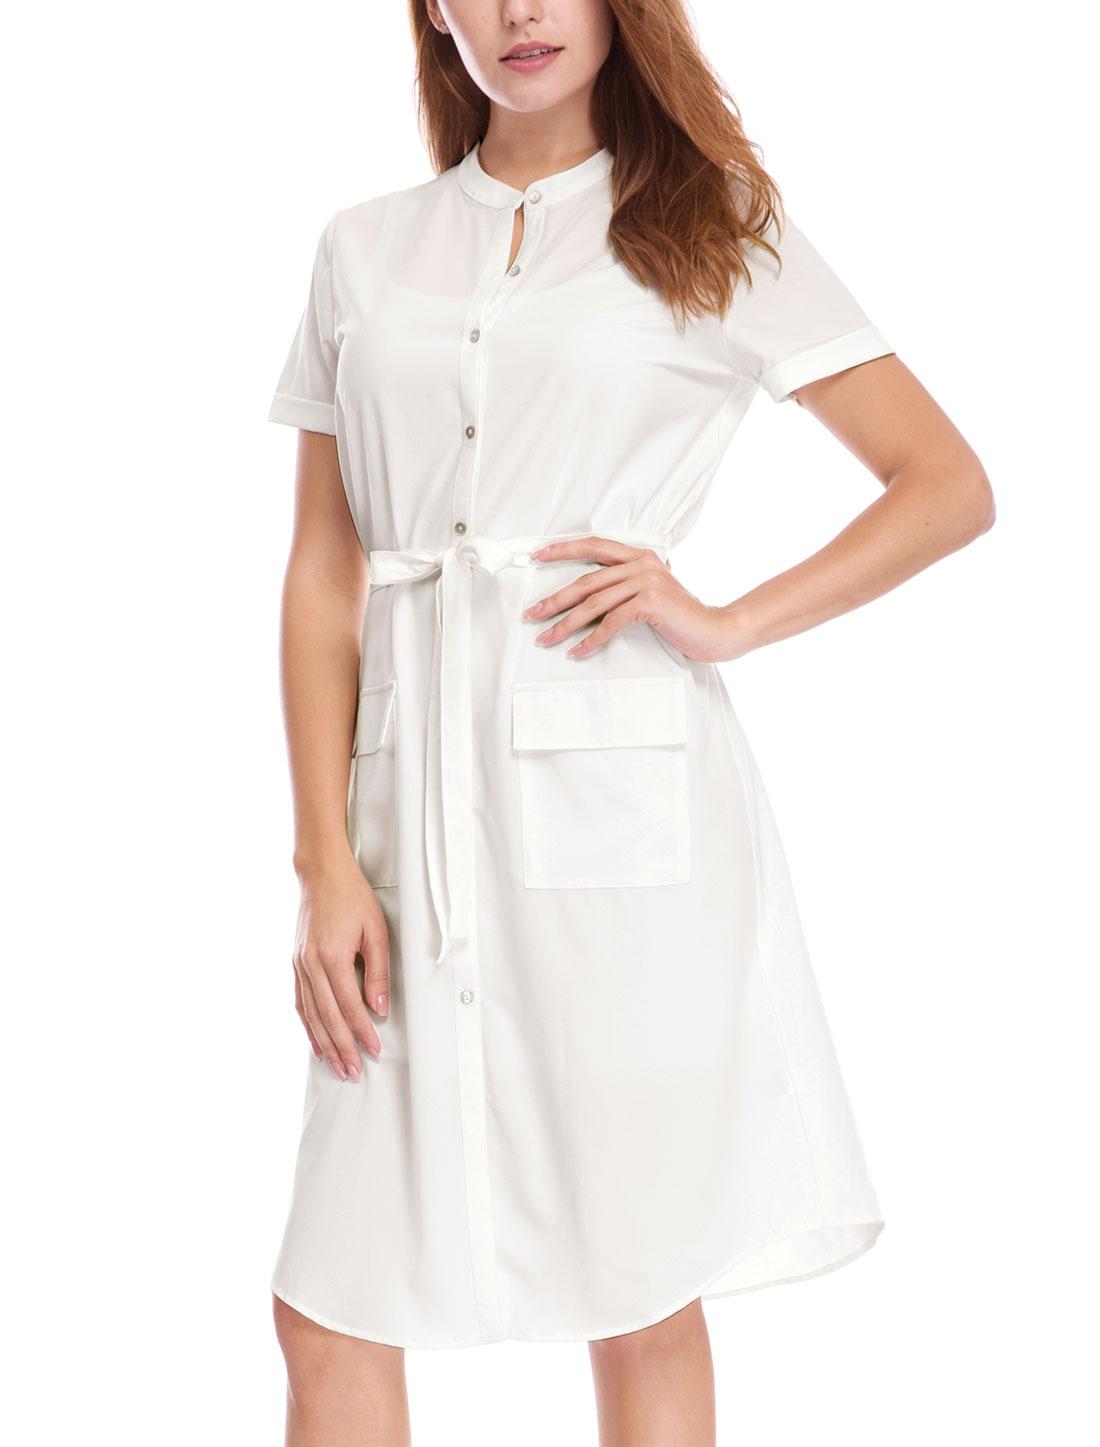 Women Short Sleeves Pockets Belted Midi Shirt Dress Off White S